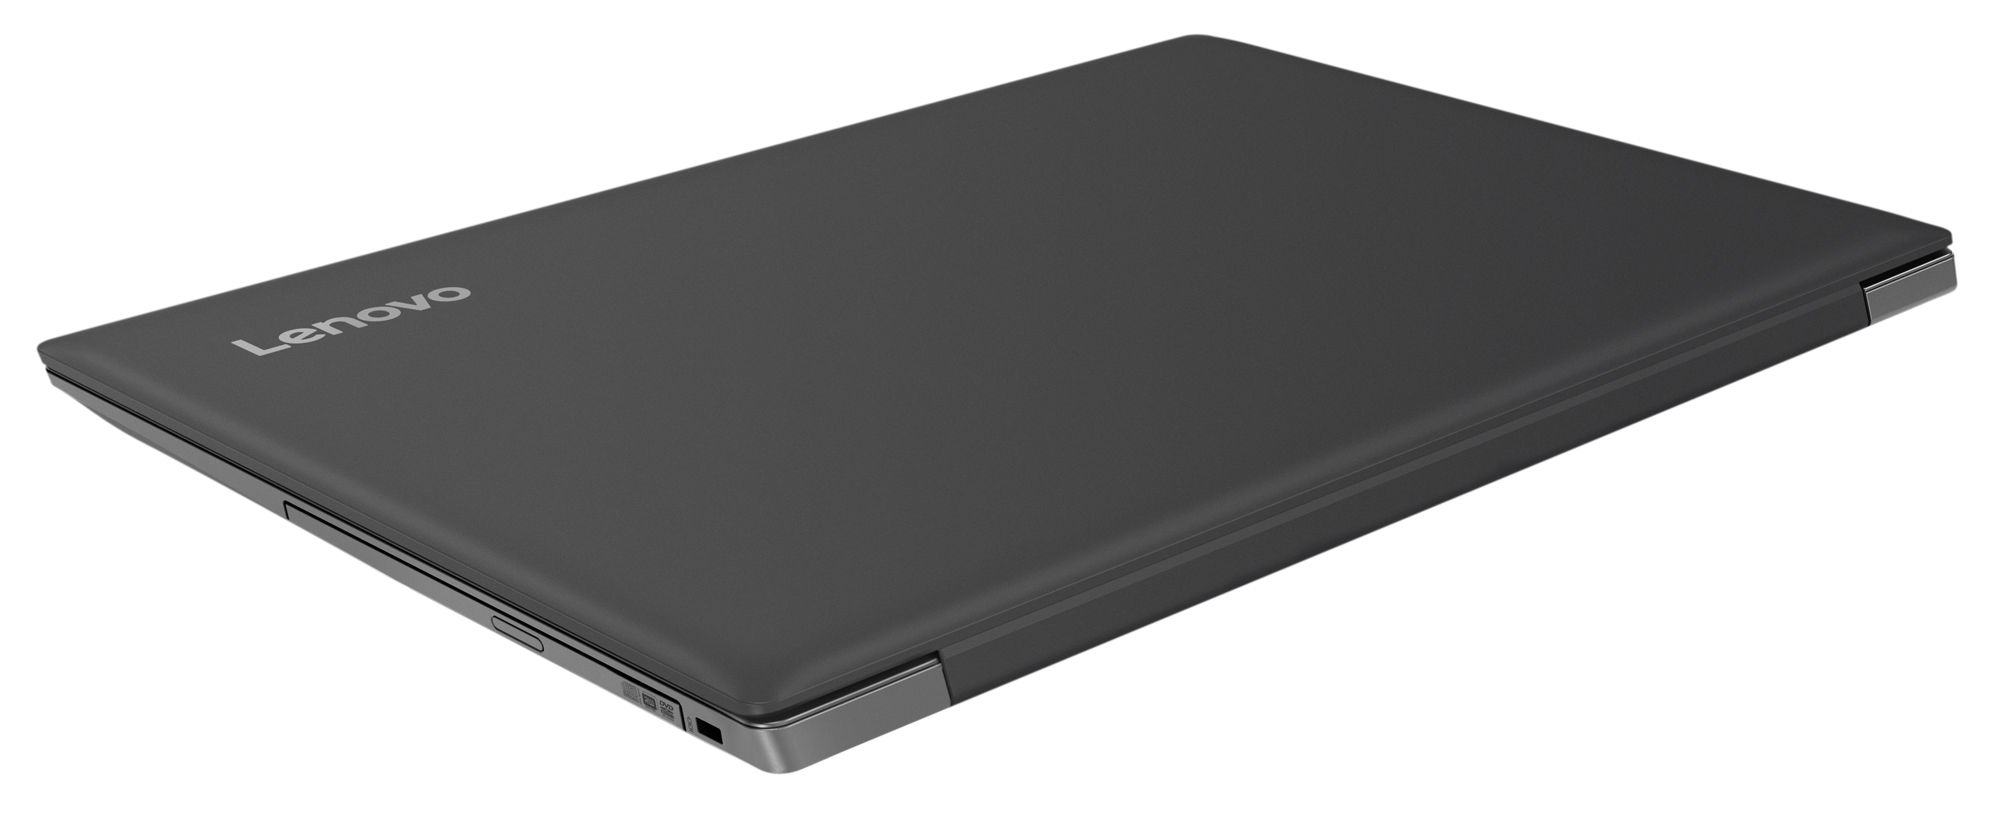 Фото  Ноутбук Lenovo ideapad 330-15 Onyx Black (81D2009RRA)